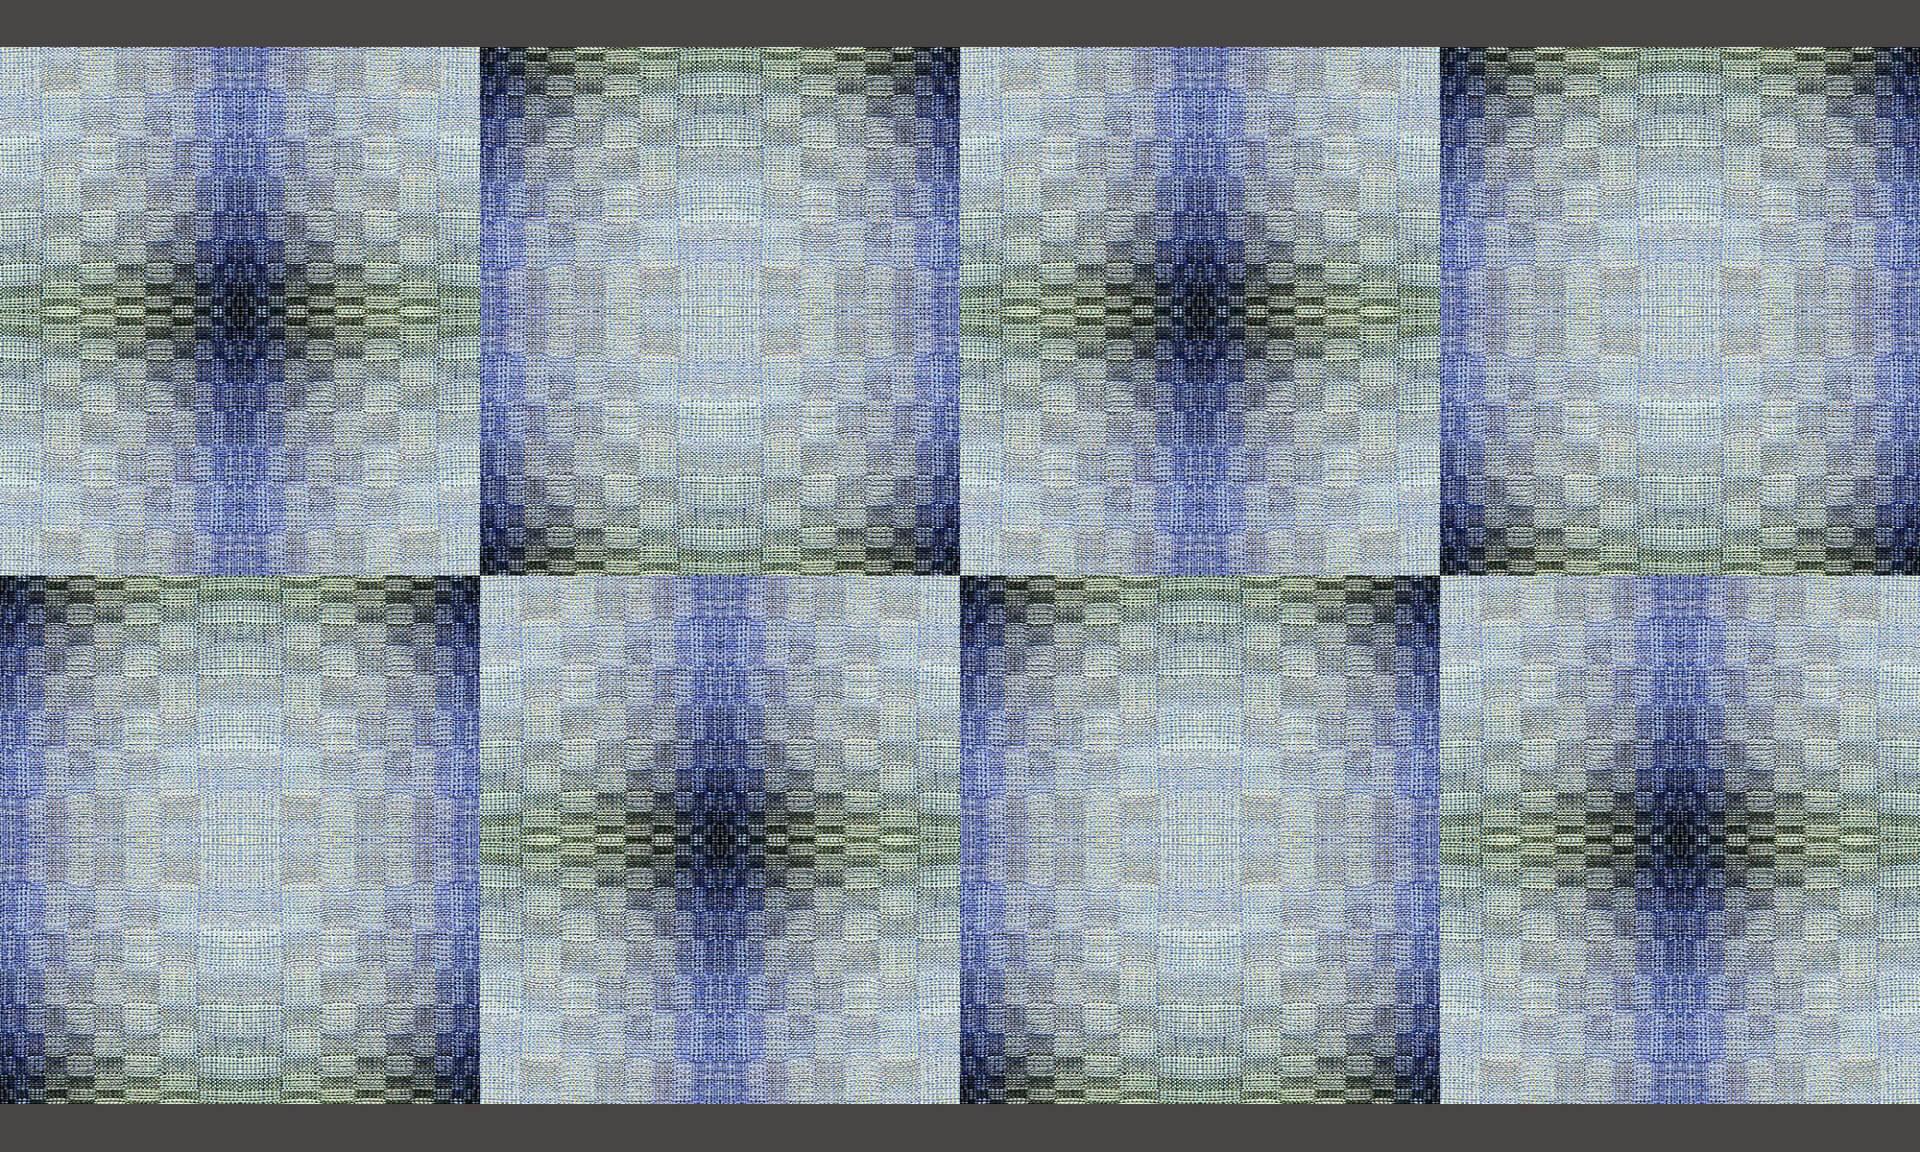 Escher Play-1&2 TE9492 Doug Garrabrants